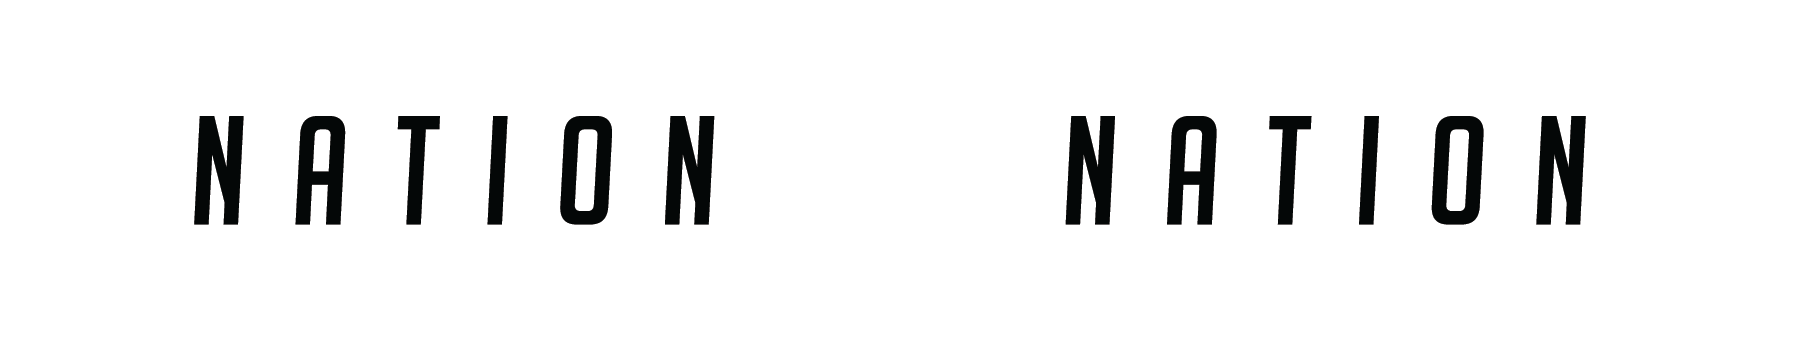 nationvsnation_logo_master-02.png